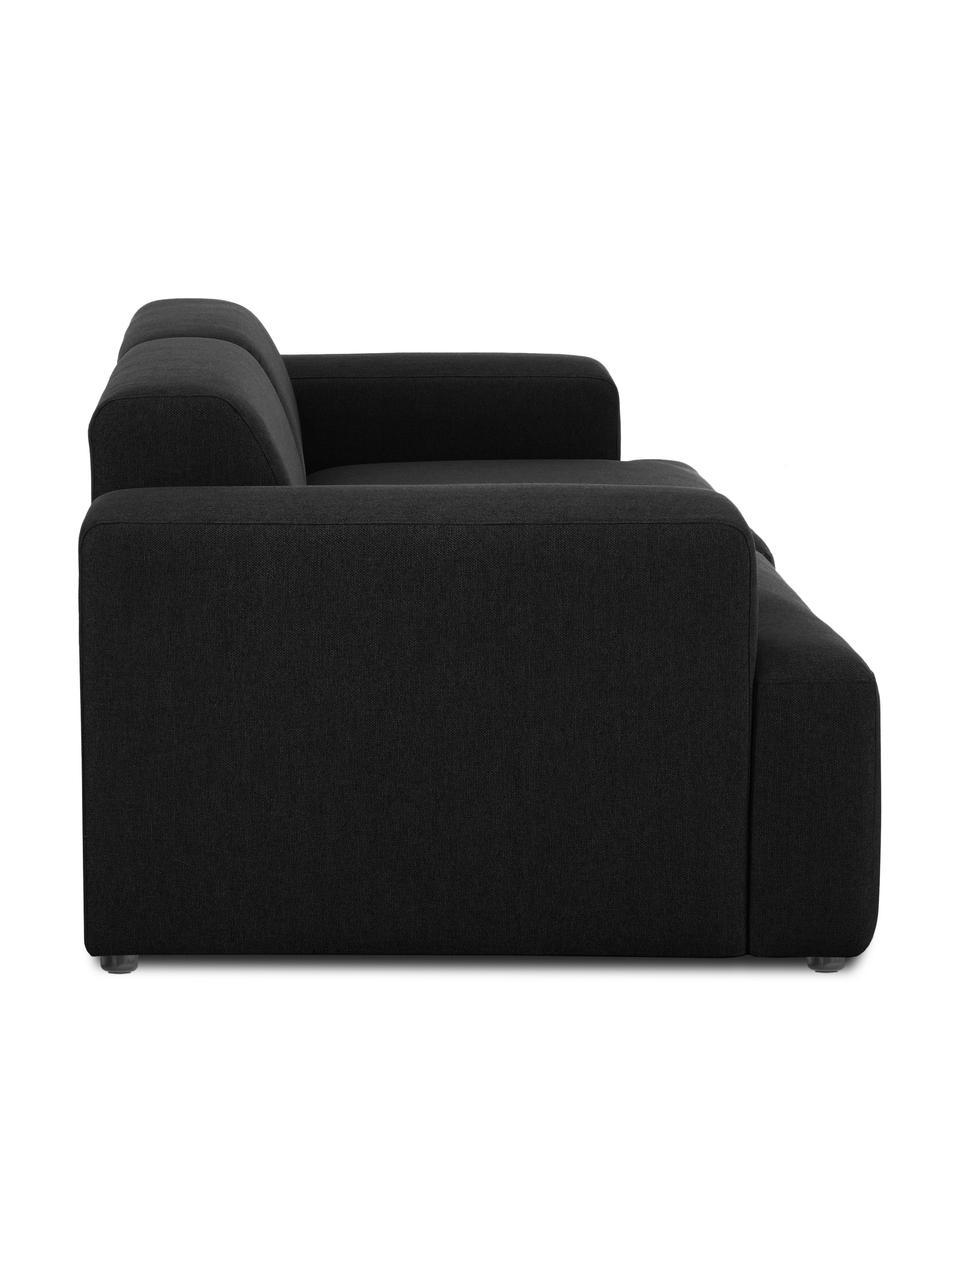 Sofa Melva (3-Sitzer) in Schwarz, Bezug: 100% Polyester Der hochwe, Gestell: Massives Kiefernholz, FSC, Füße: Kunststoff, Webstoff Schwarz, B 238 x T 101 cm